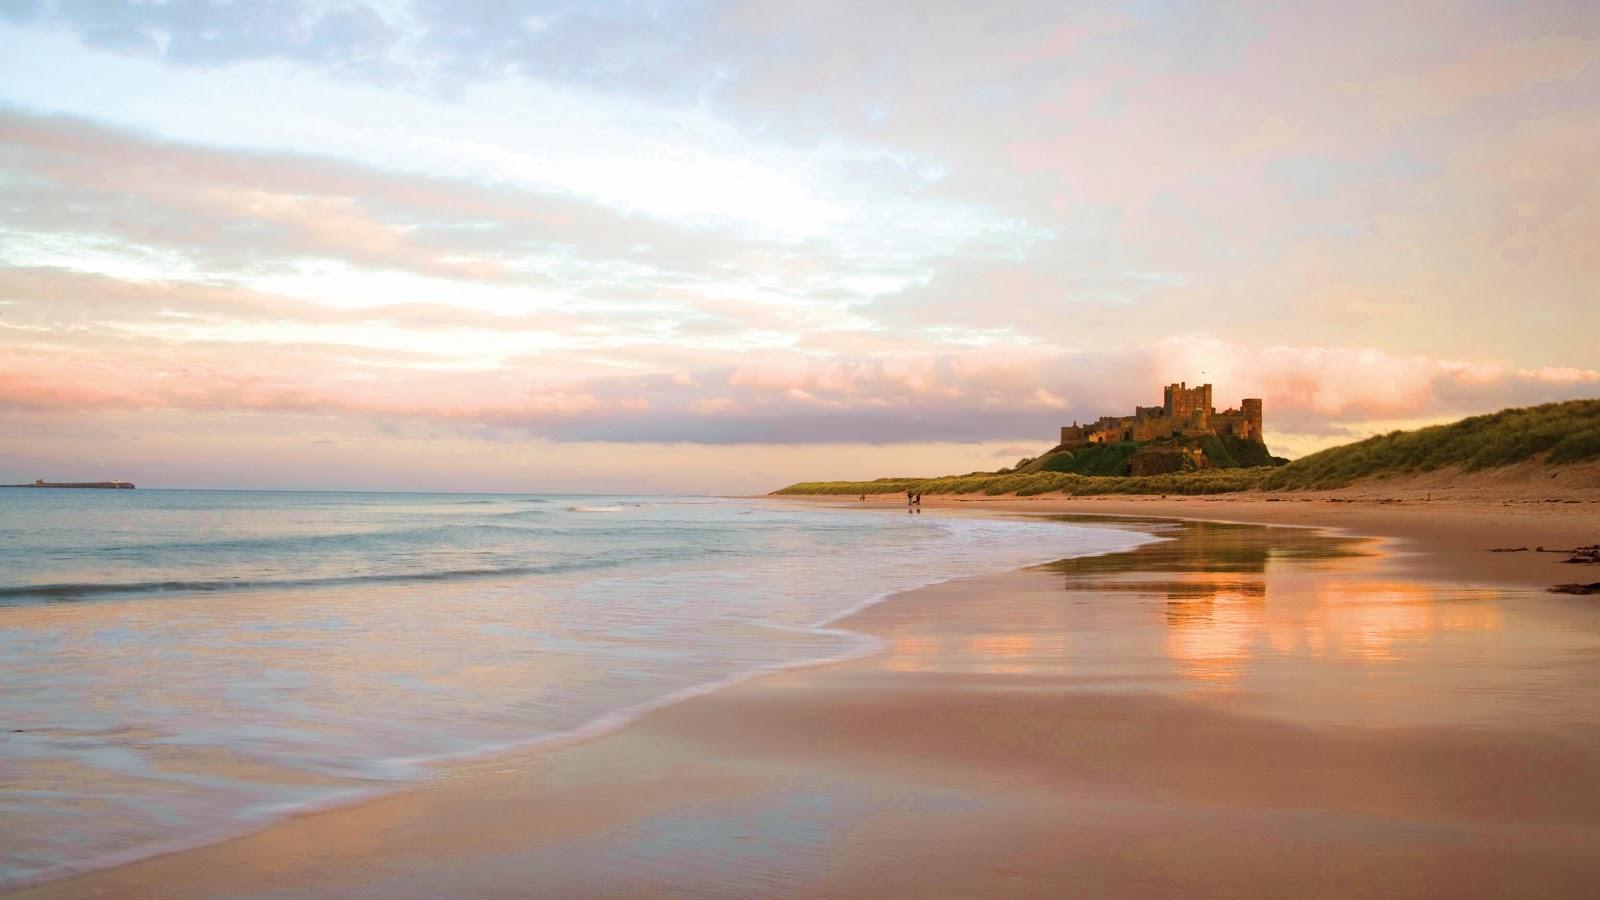 bamburgh castle beach, northumberland, uk